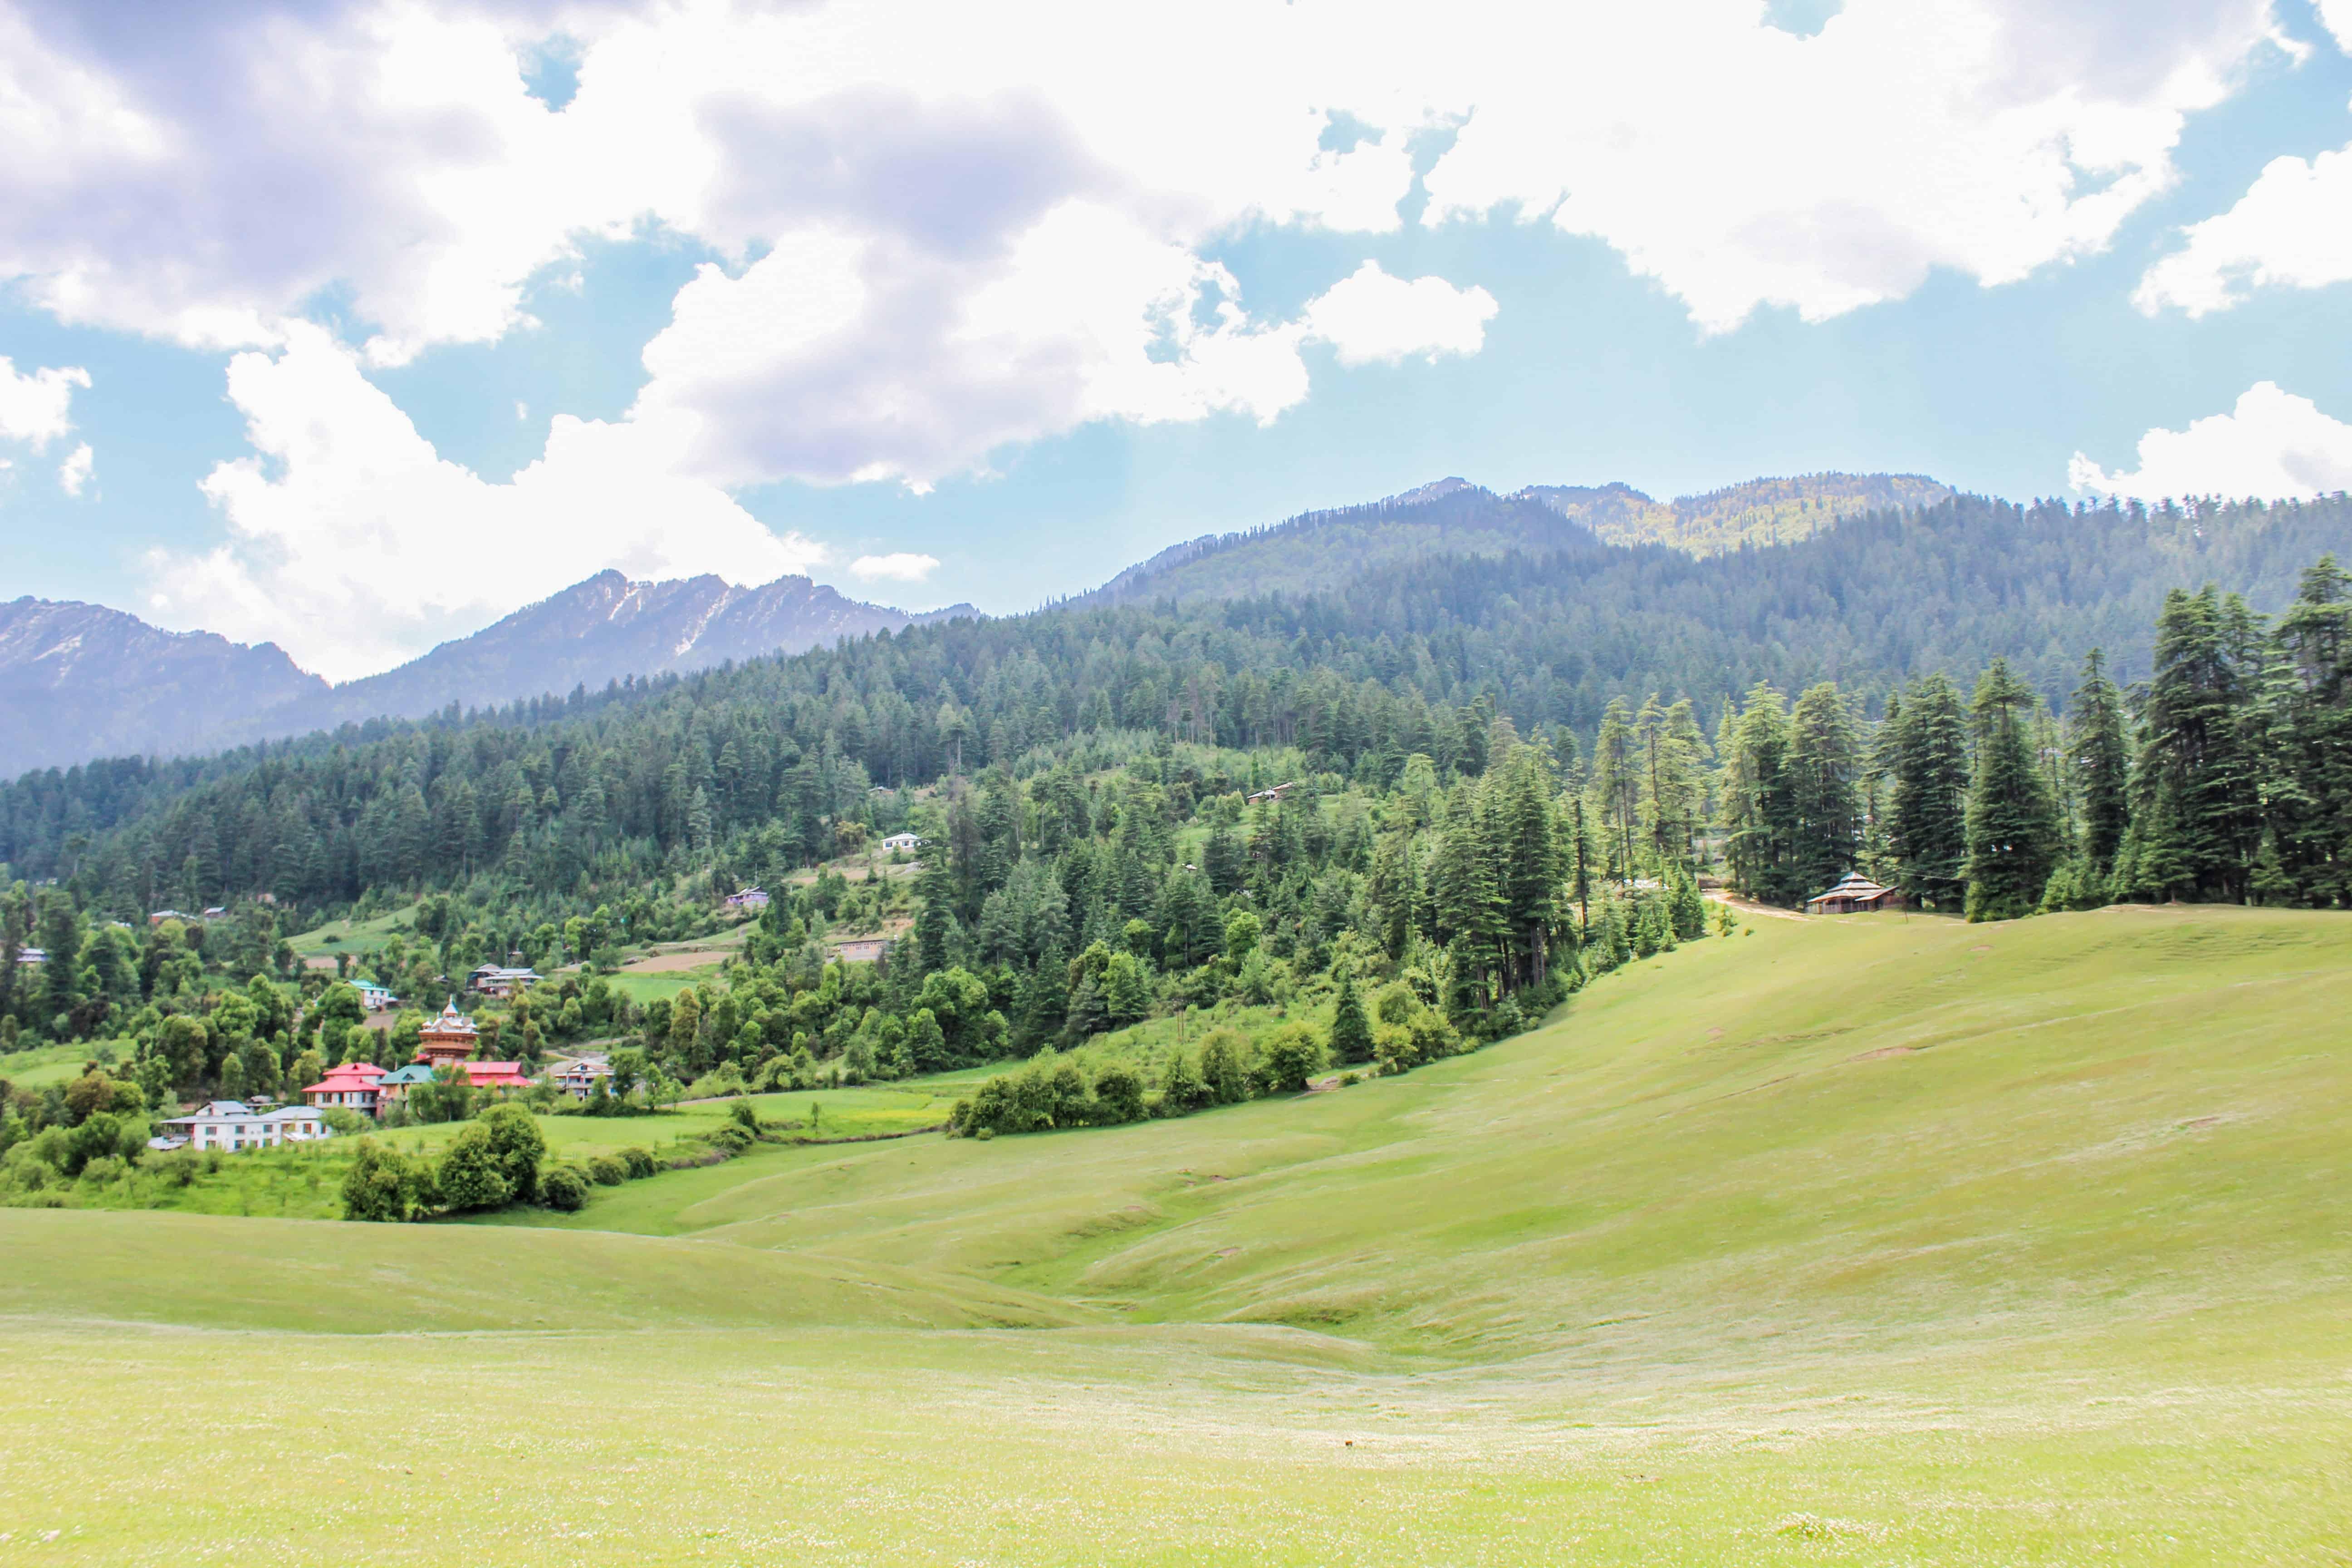 Shangarh meadow